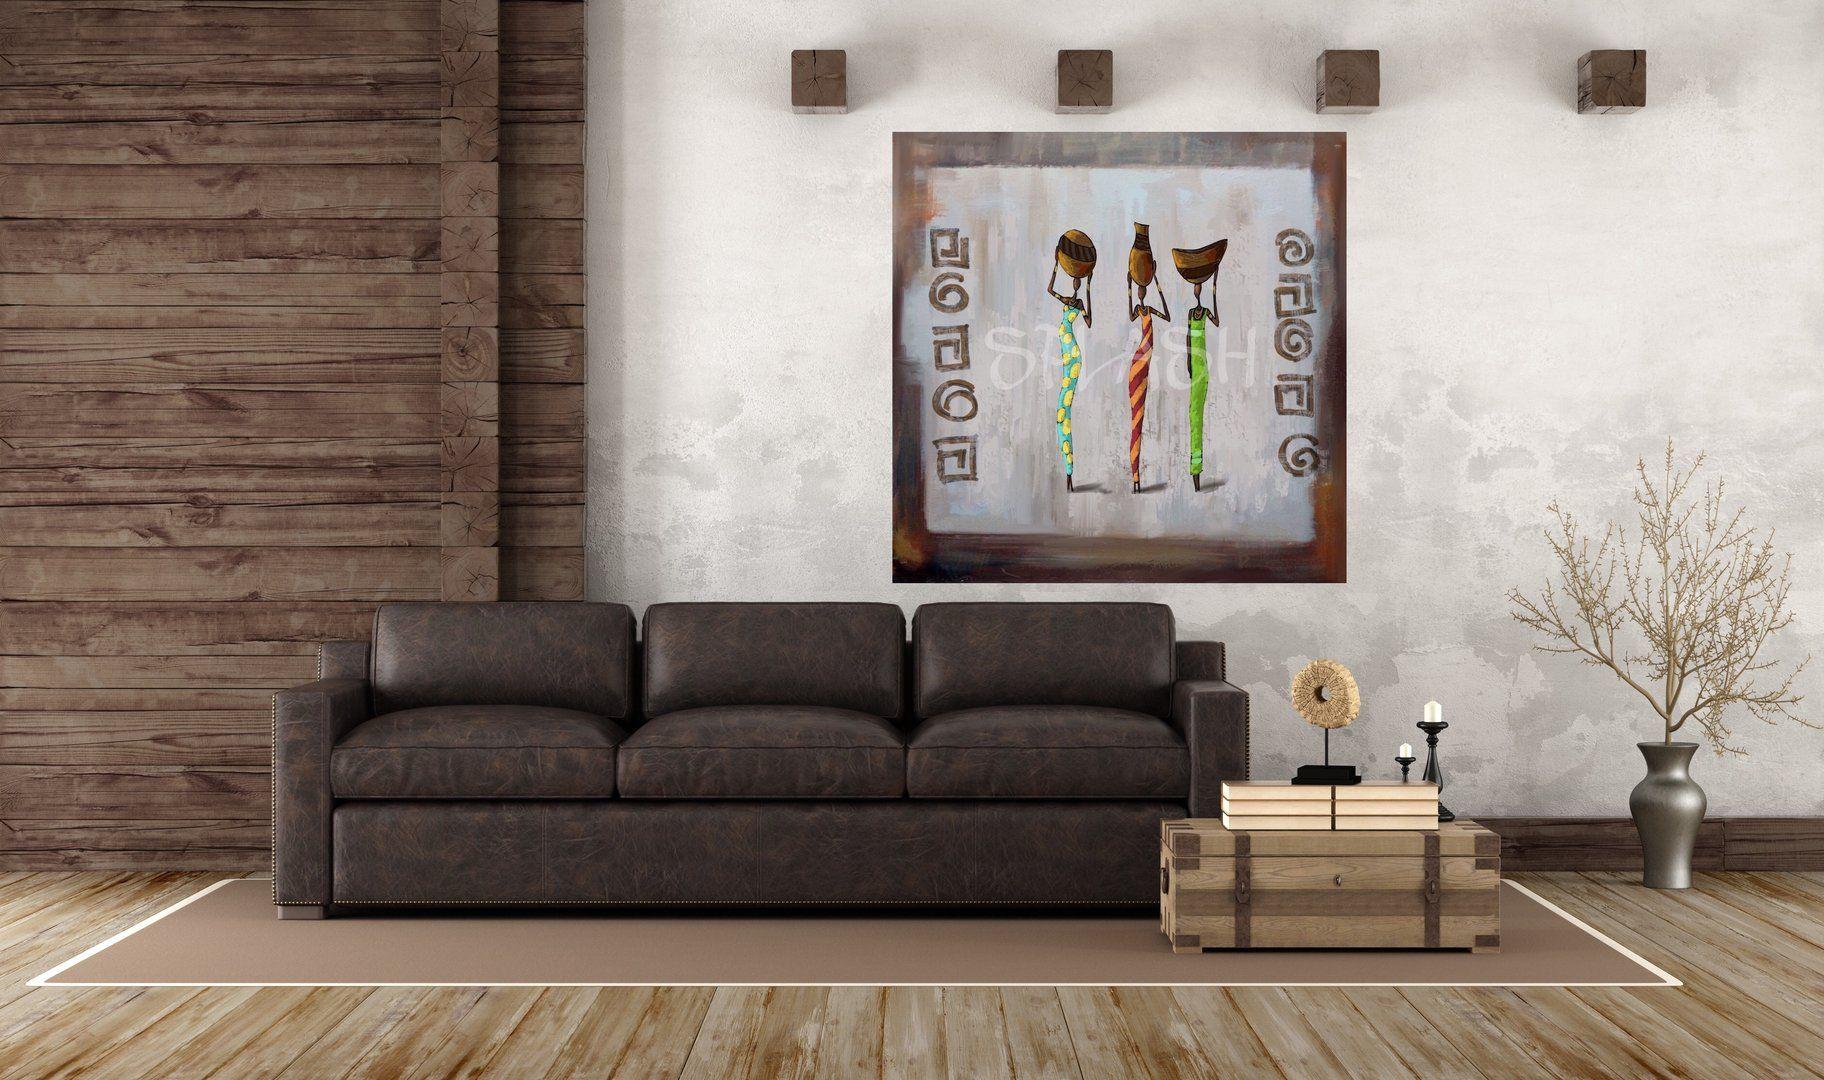 cuadros modernos cuadros decorativos cuadros etnicos cuadros baratos cuadros para salon